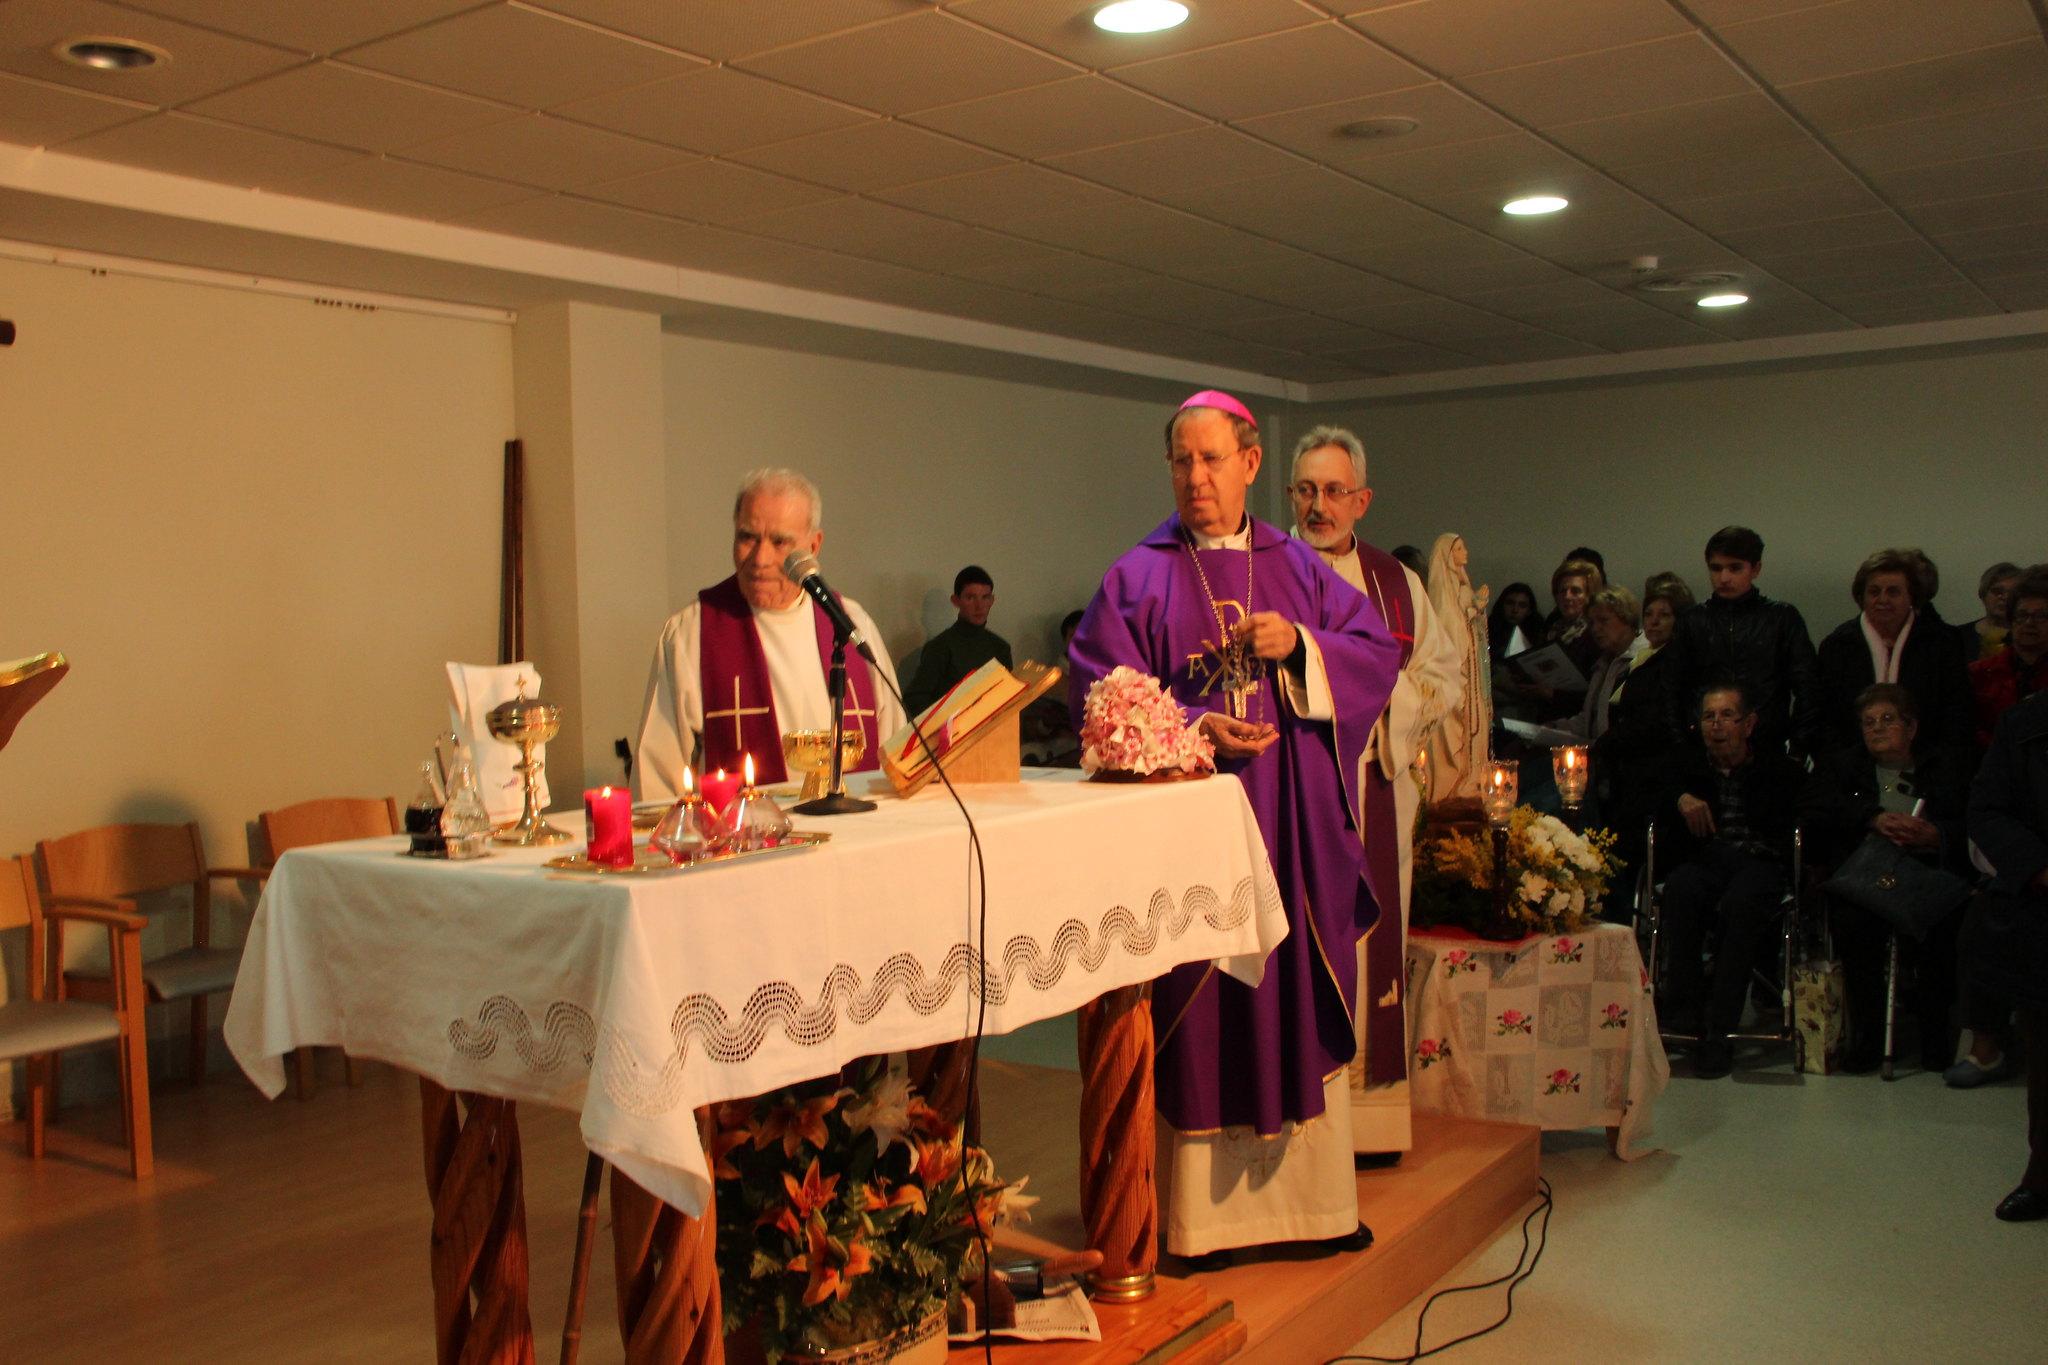 (2016-02-13) - Inauguración Virgen De Lourdes, La Molineta - Archivo La Molineta (040)